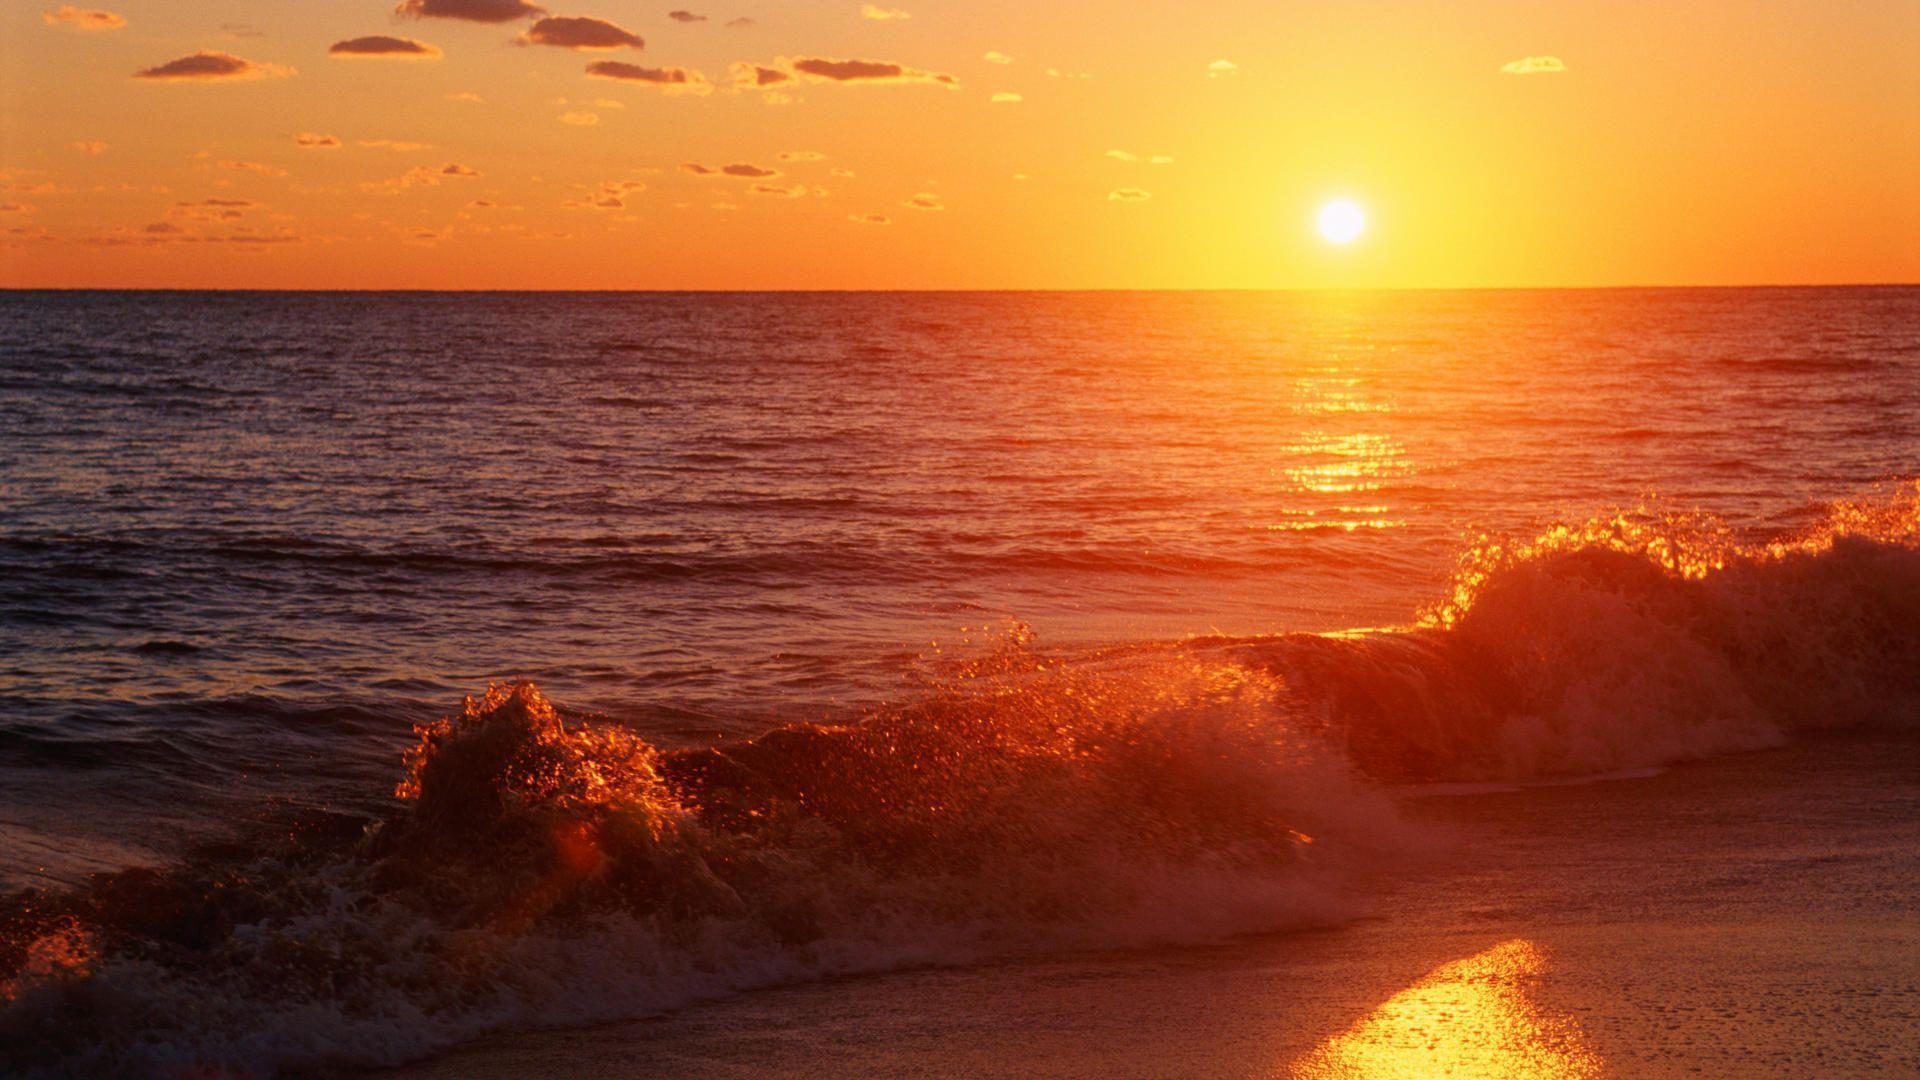 tags sunset 26 pics california 377 pics beach 40 pics pismo beach is a 1920x1080